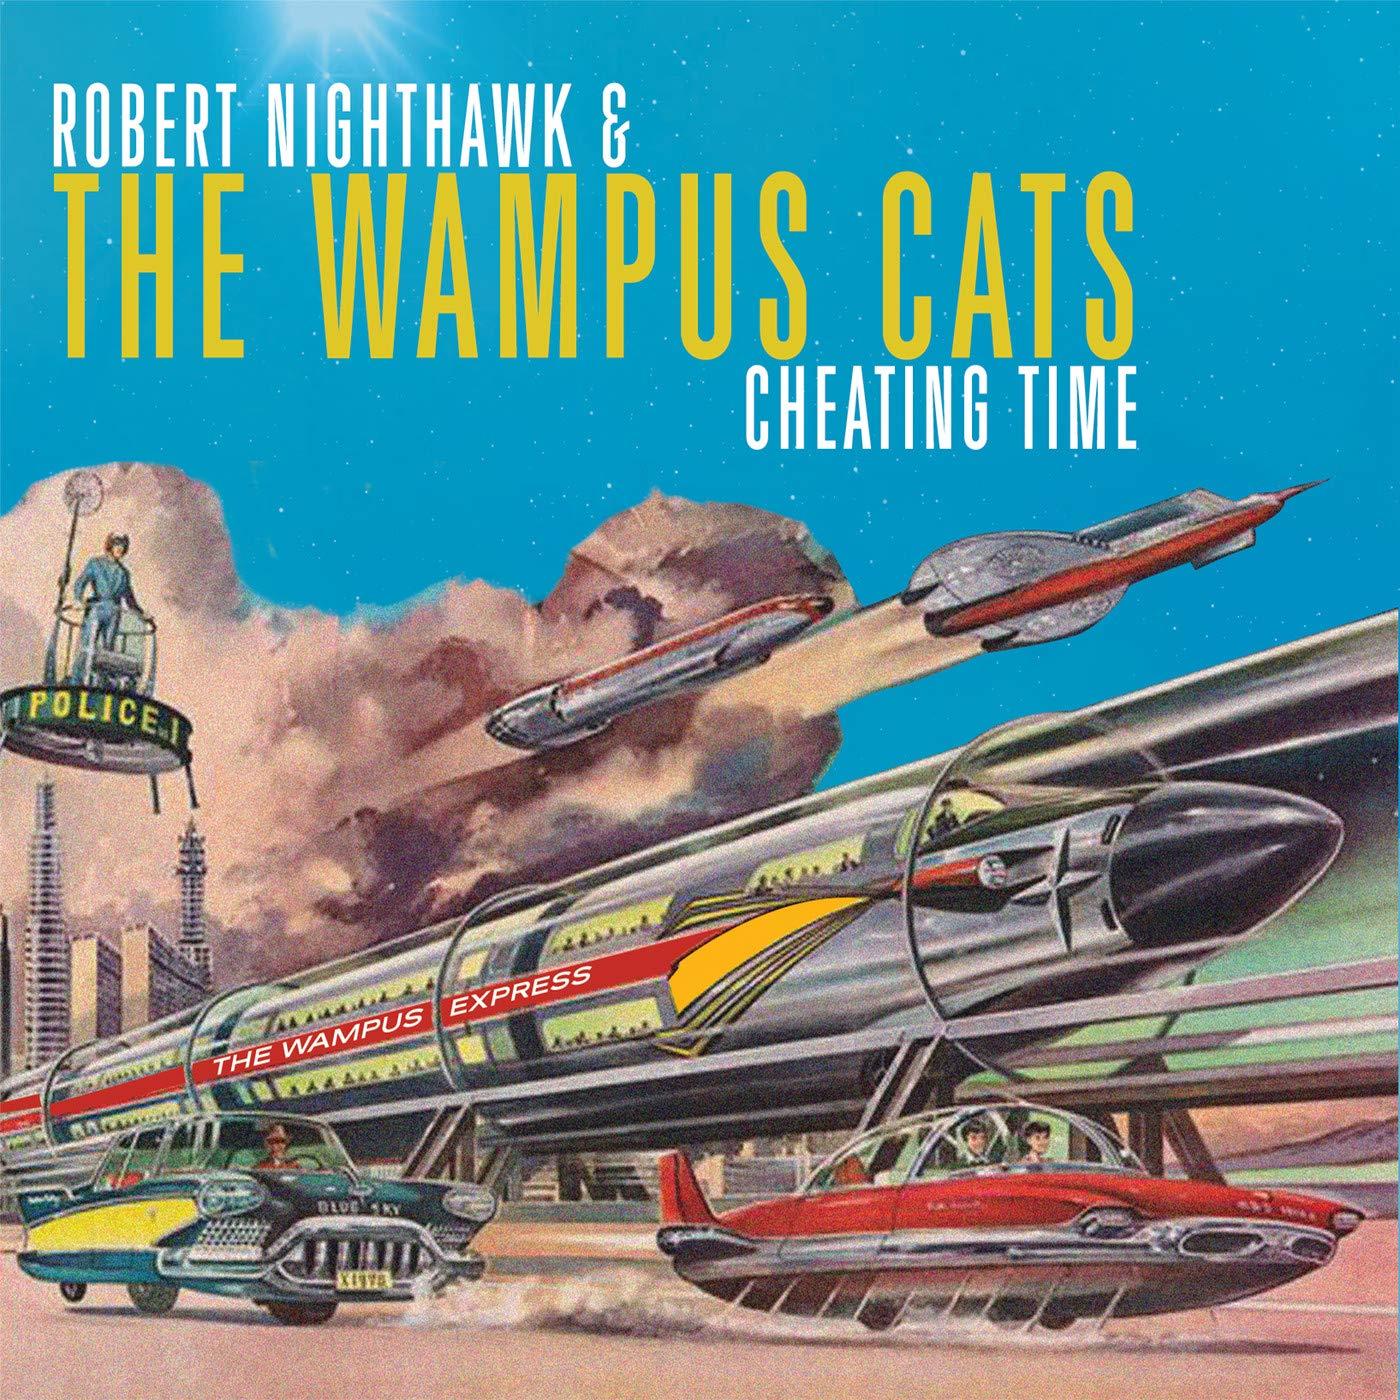 CD : ROBERT NIGHTHAWK & THE WAMPUS CATS - Cheating Time (CD)